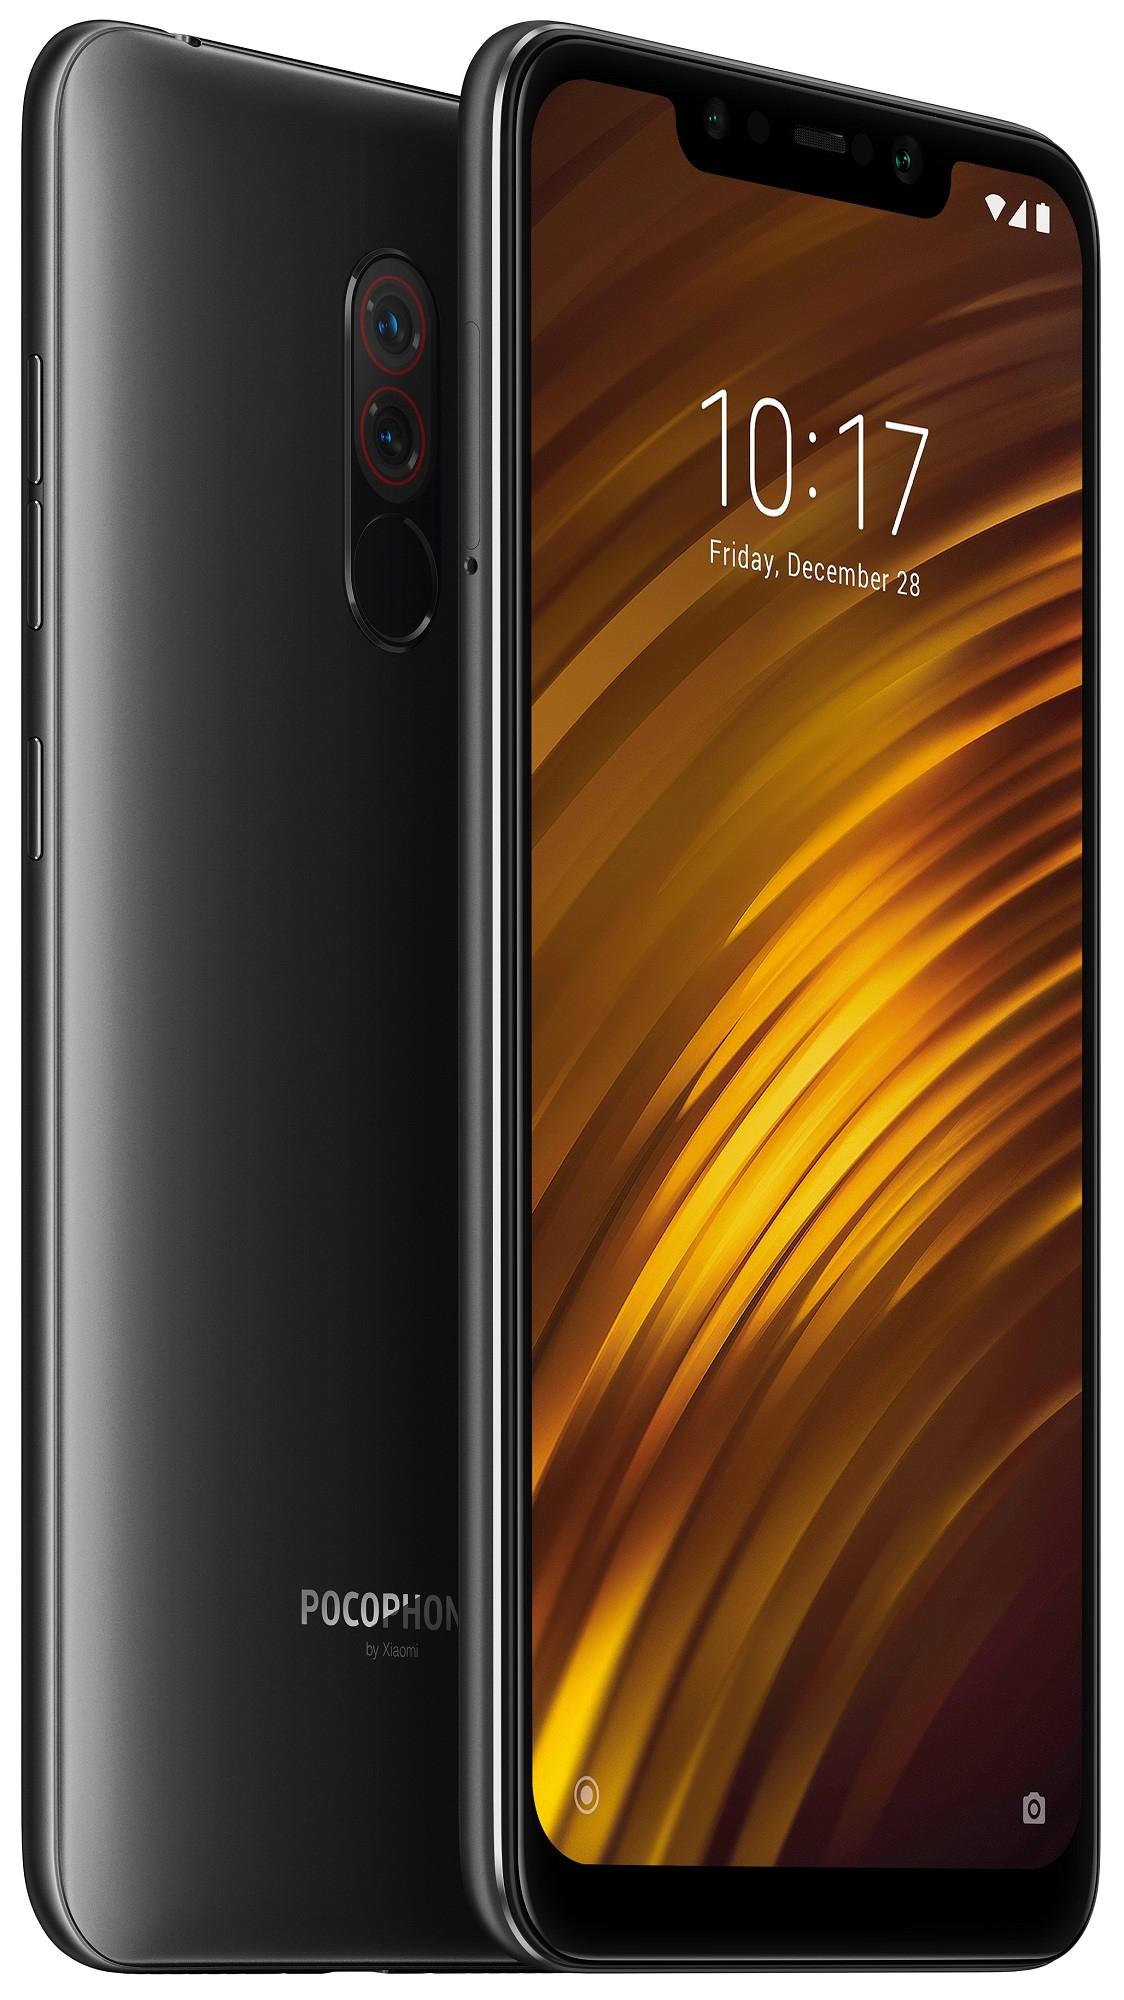 Xiaomi Pocophone F1 Black (Global Version) 6GB RAM 64GB ROM @ AliExpress - Tonke - £232